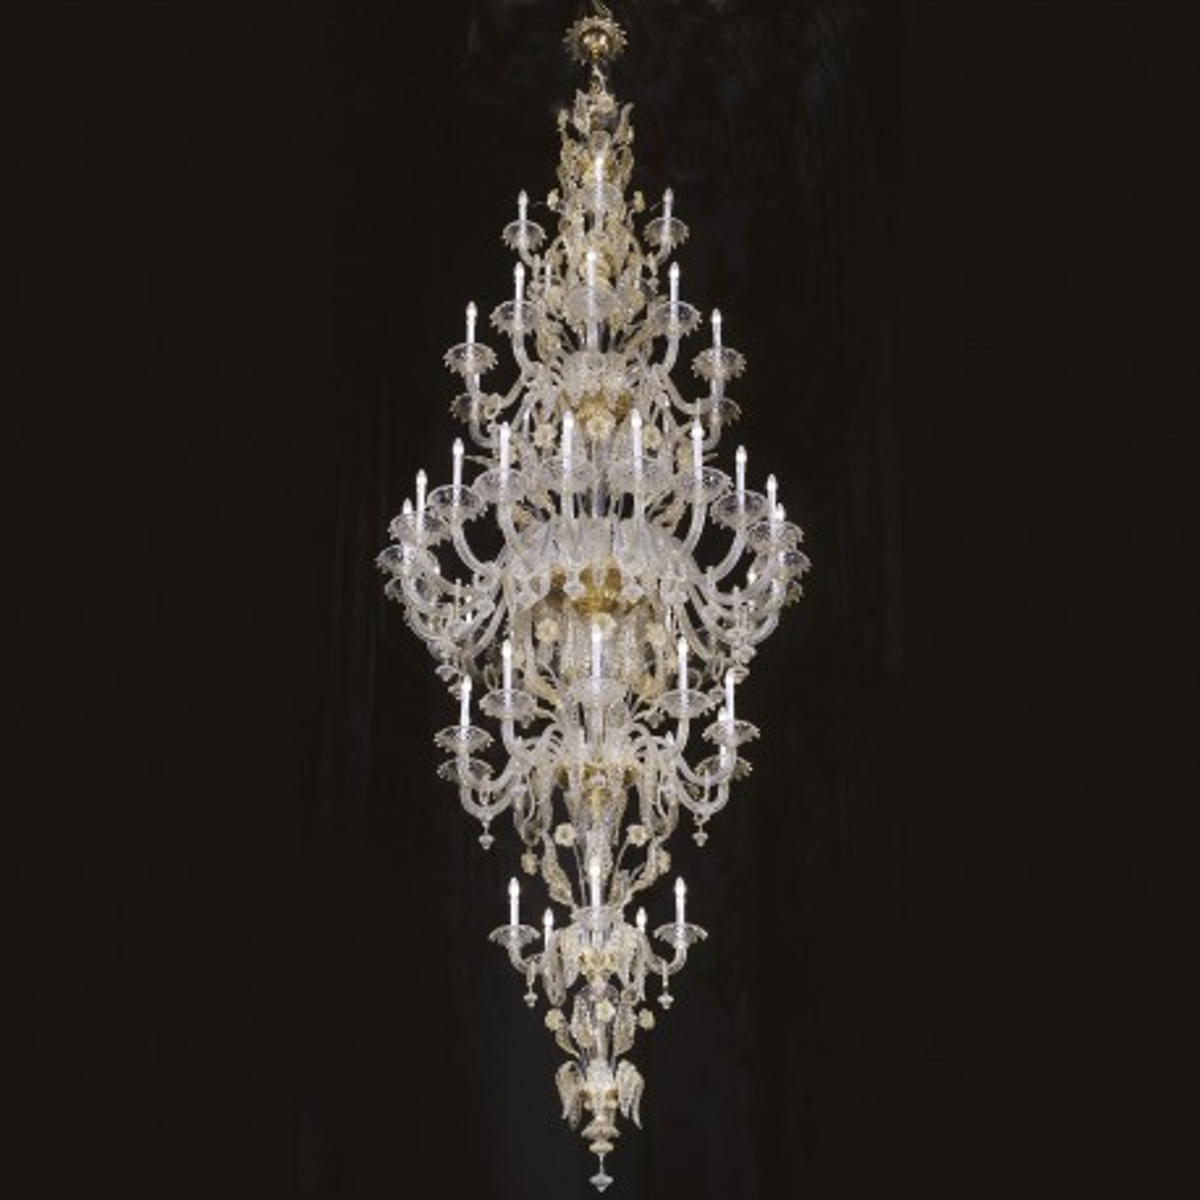 """Barberini"" lustre en verre de Murano - 50 lumieres"